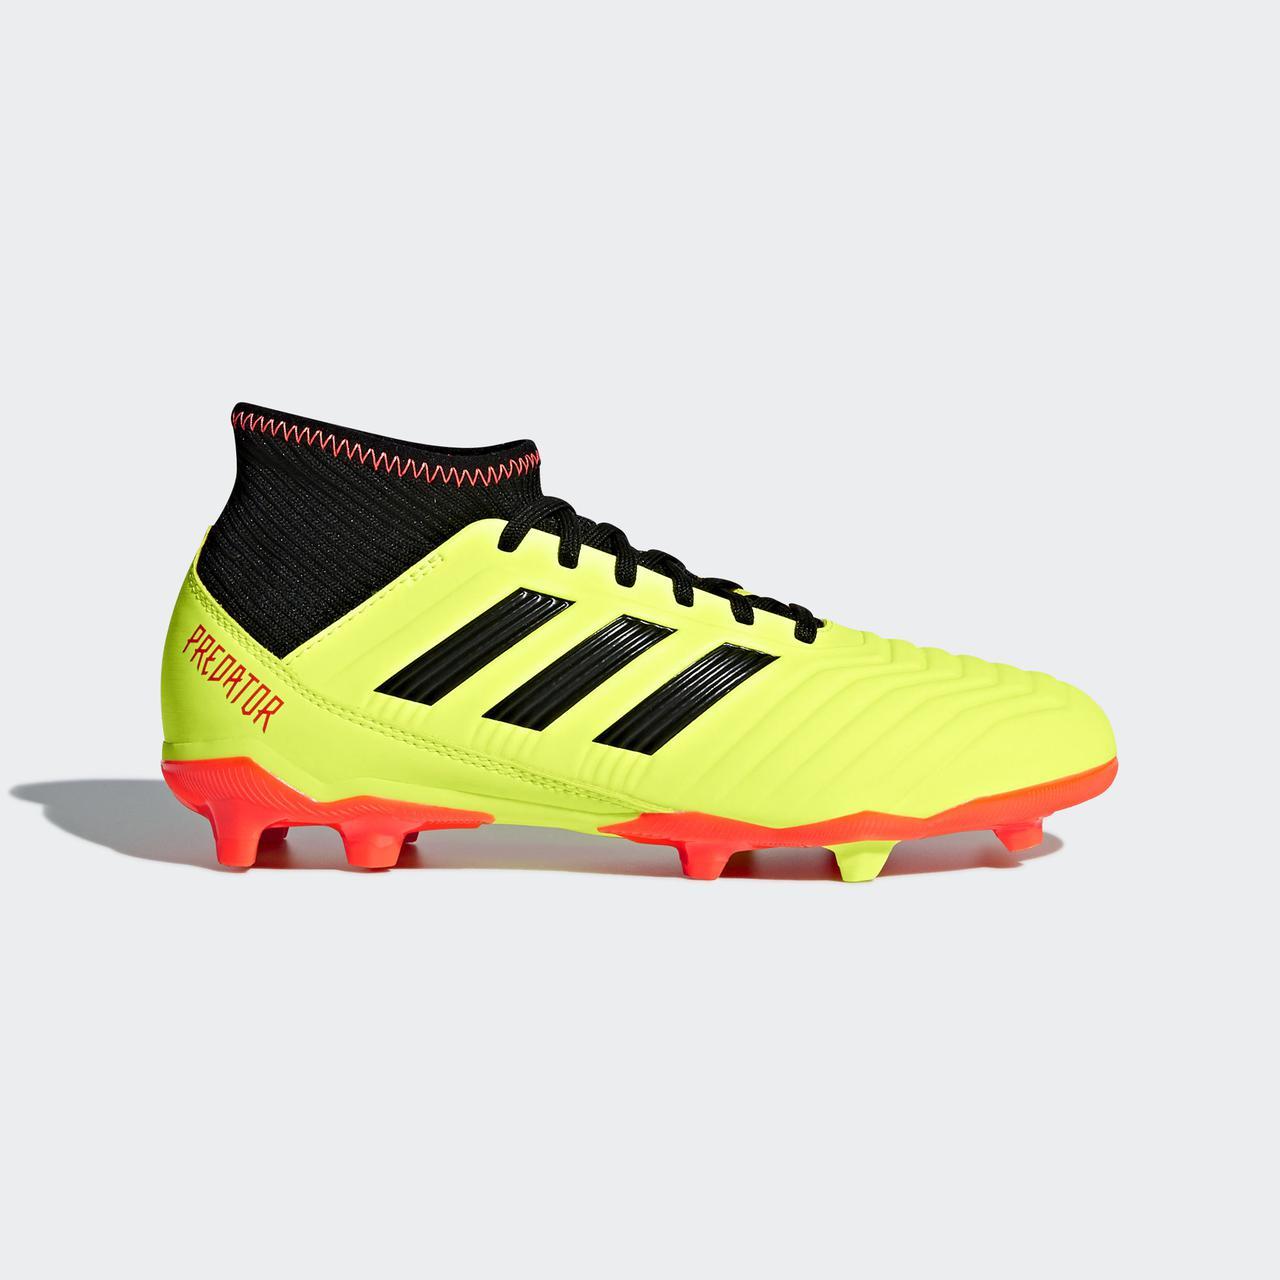 db1a414b1b32 Детские футбольные бутсы Adidas Performance Predator 18.3 FG (Артикул   DB2319)